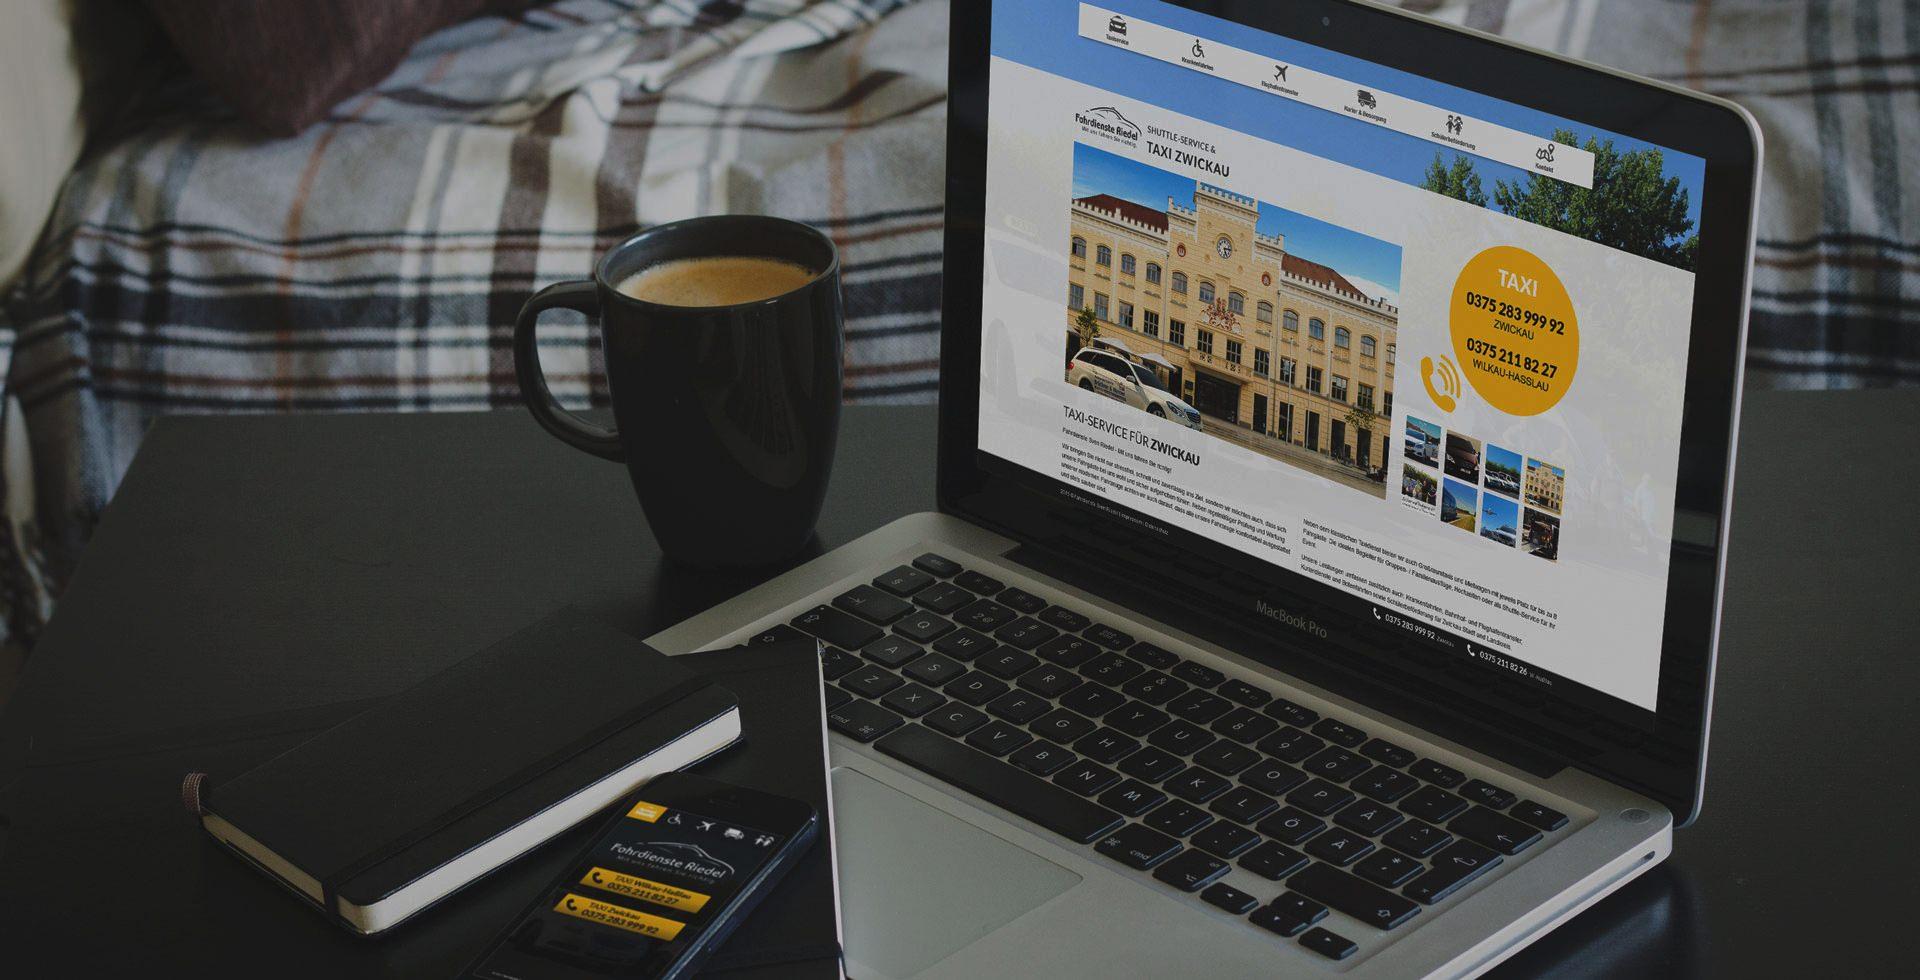 Colorando: Professionelles Webdesign im Erzgebirge, Zwickau und Umgebung